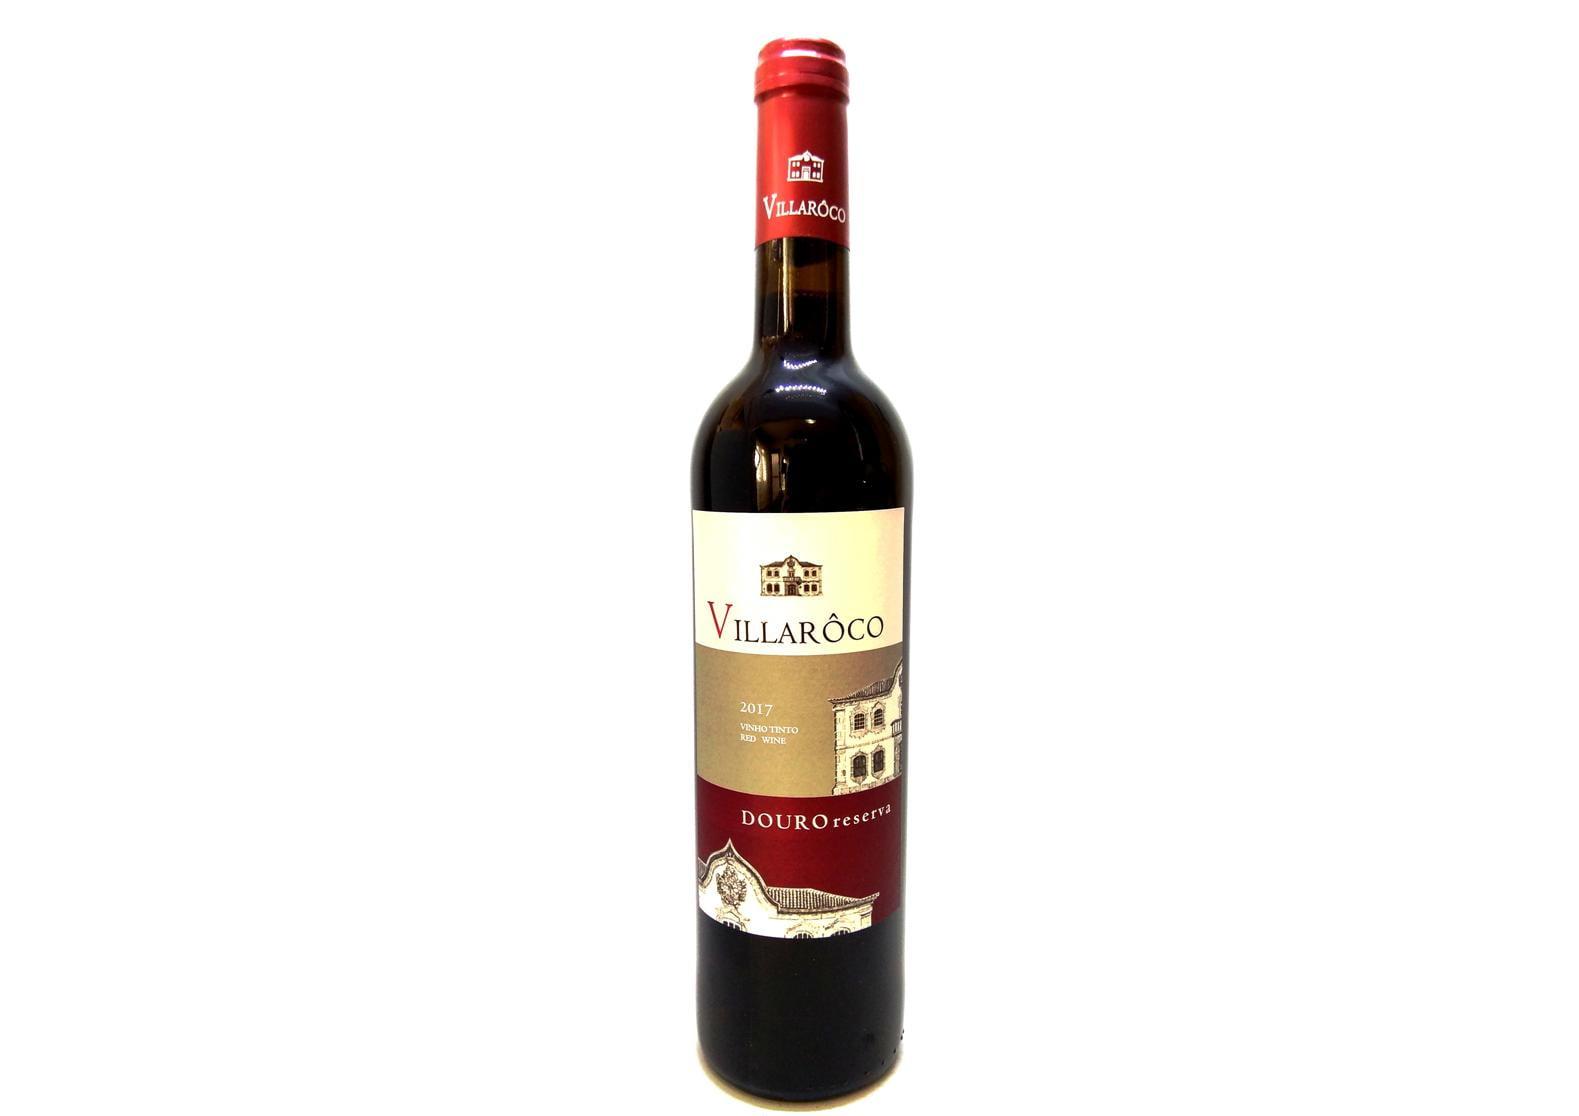 Quinta Villaroco - Rouge reserva 2016 - Vins du Douro